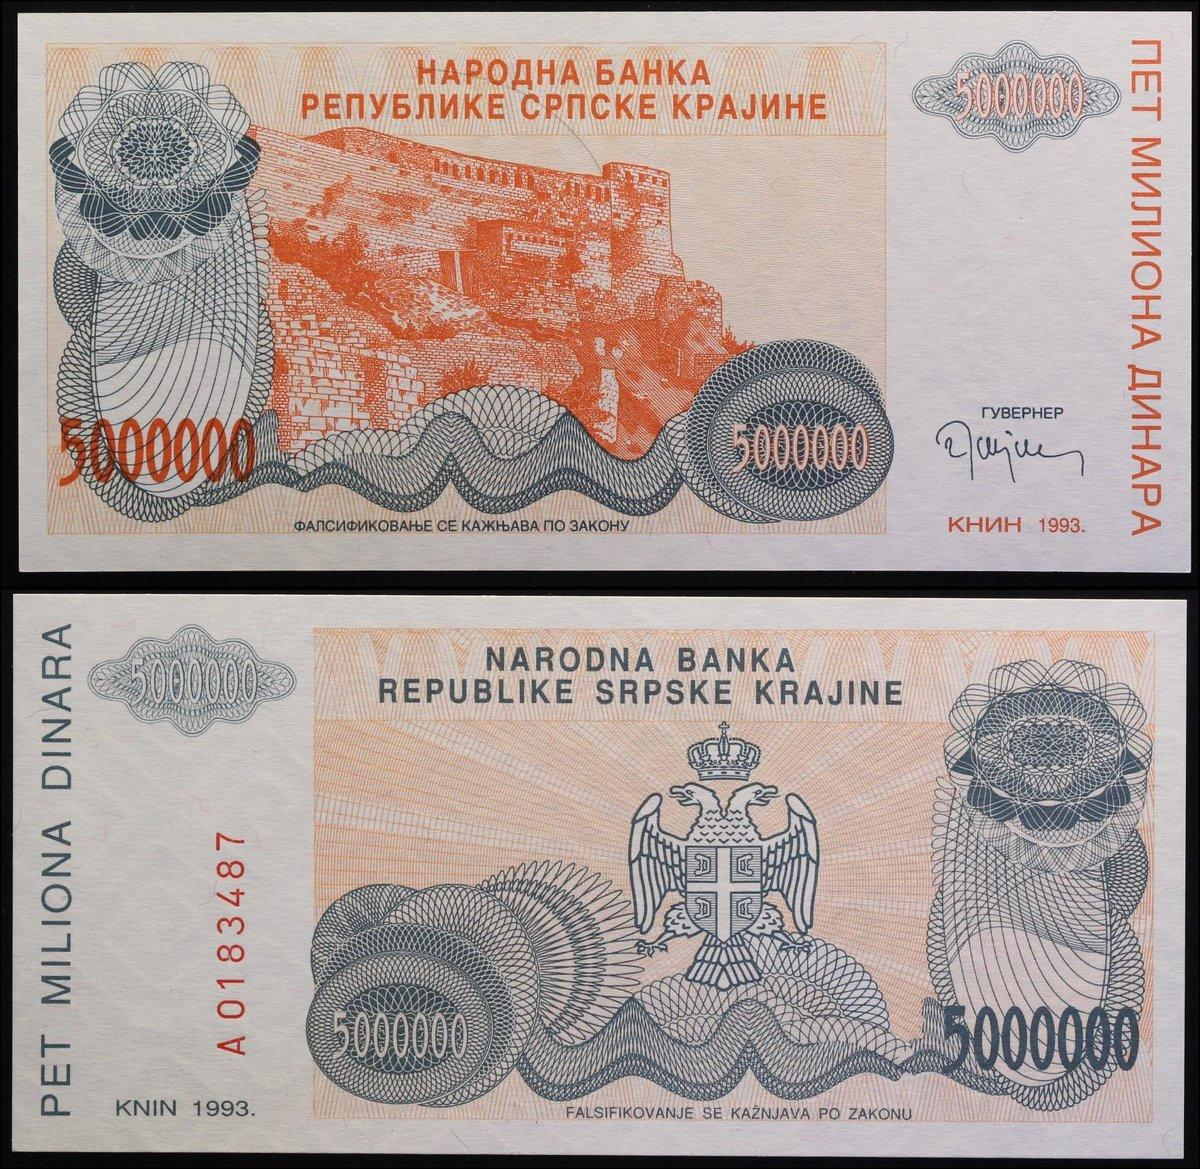 YUGOSLAVIA 10 DINARA 1981 P 87 b UNC LOT 10 PCS